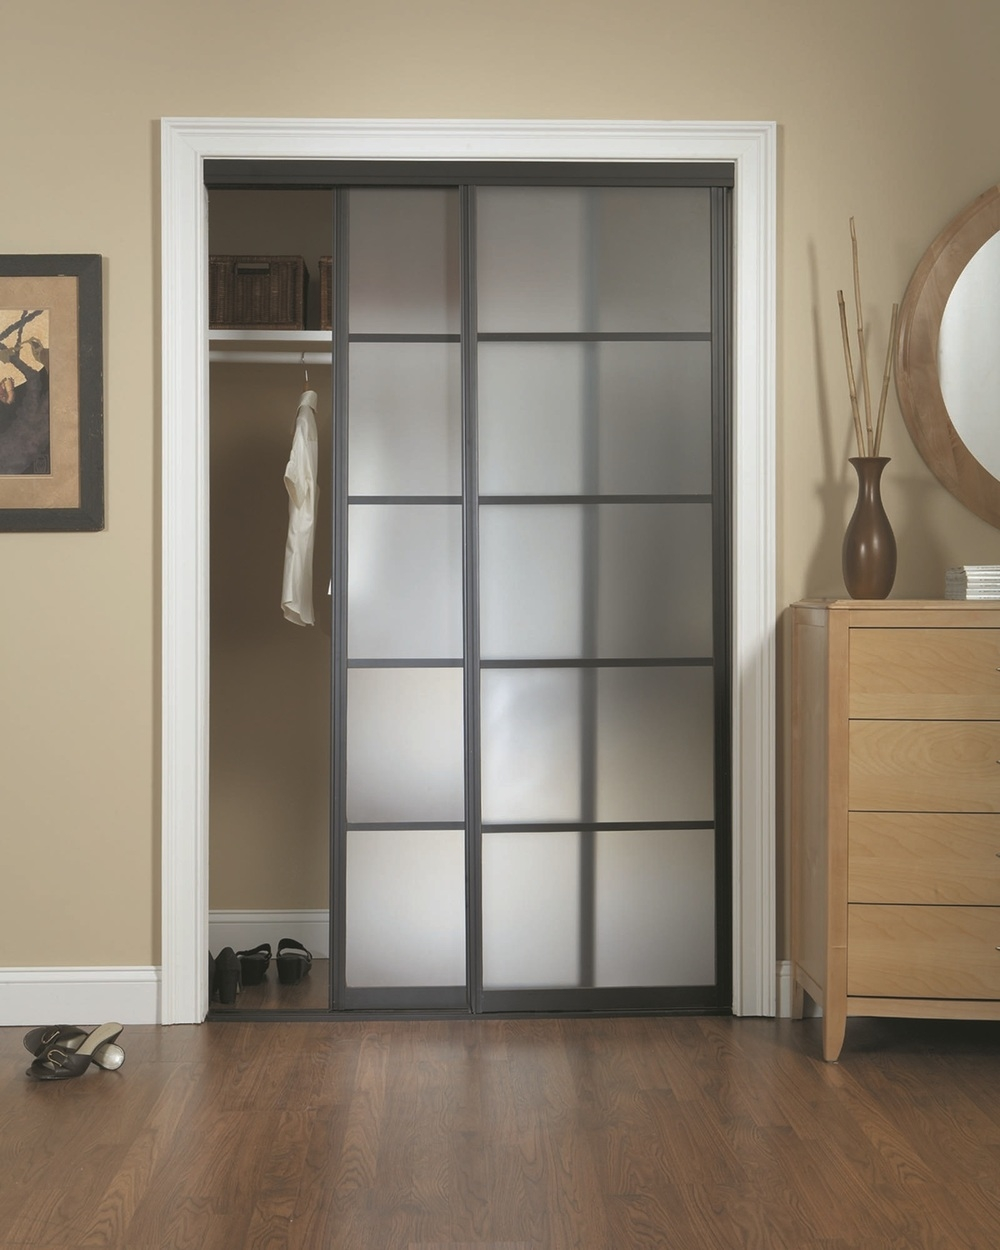 Custom Mirror Closet Sliding Doorscloset doors interior doors and closets